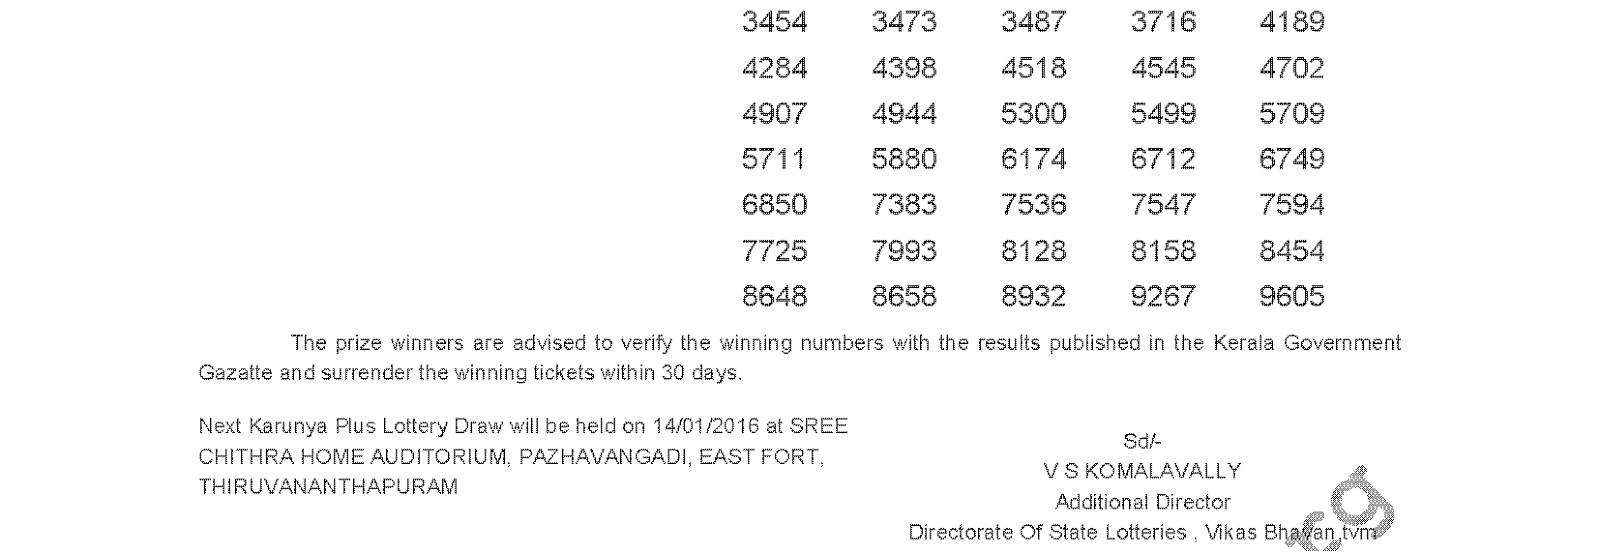 KARUNYA PLUS Lottery KN 91 Result 7-1-2016